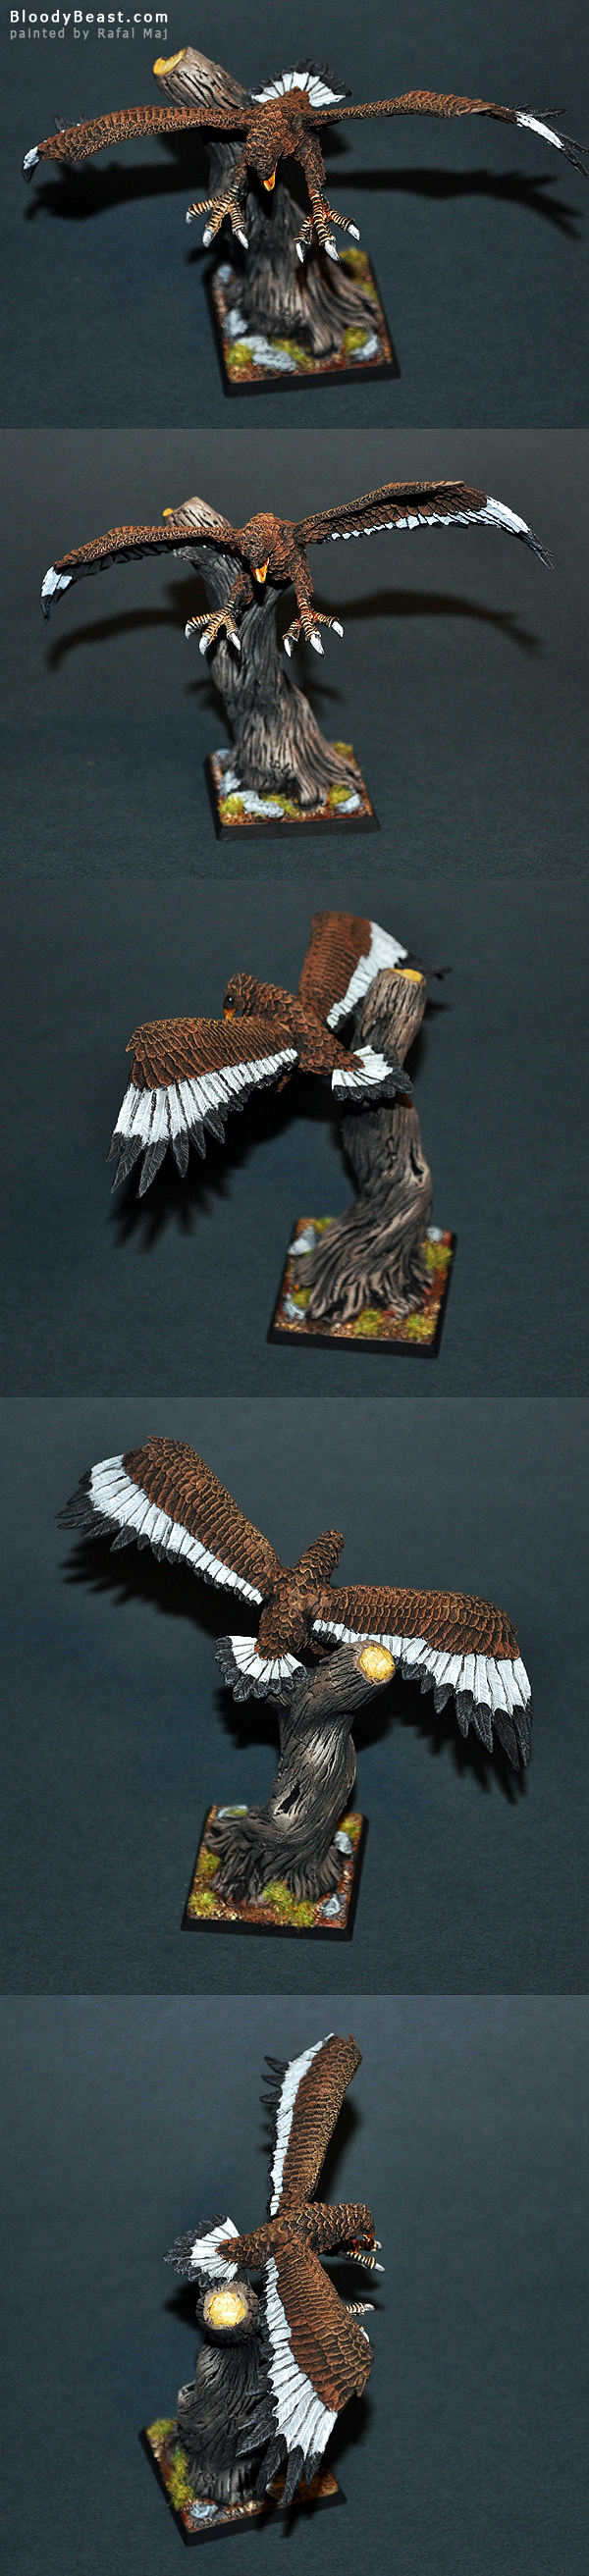 Wood Elf Great Eagle painted by Rafal Maj (BloodyBeast.com)